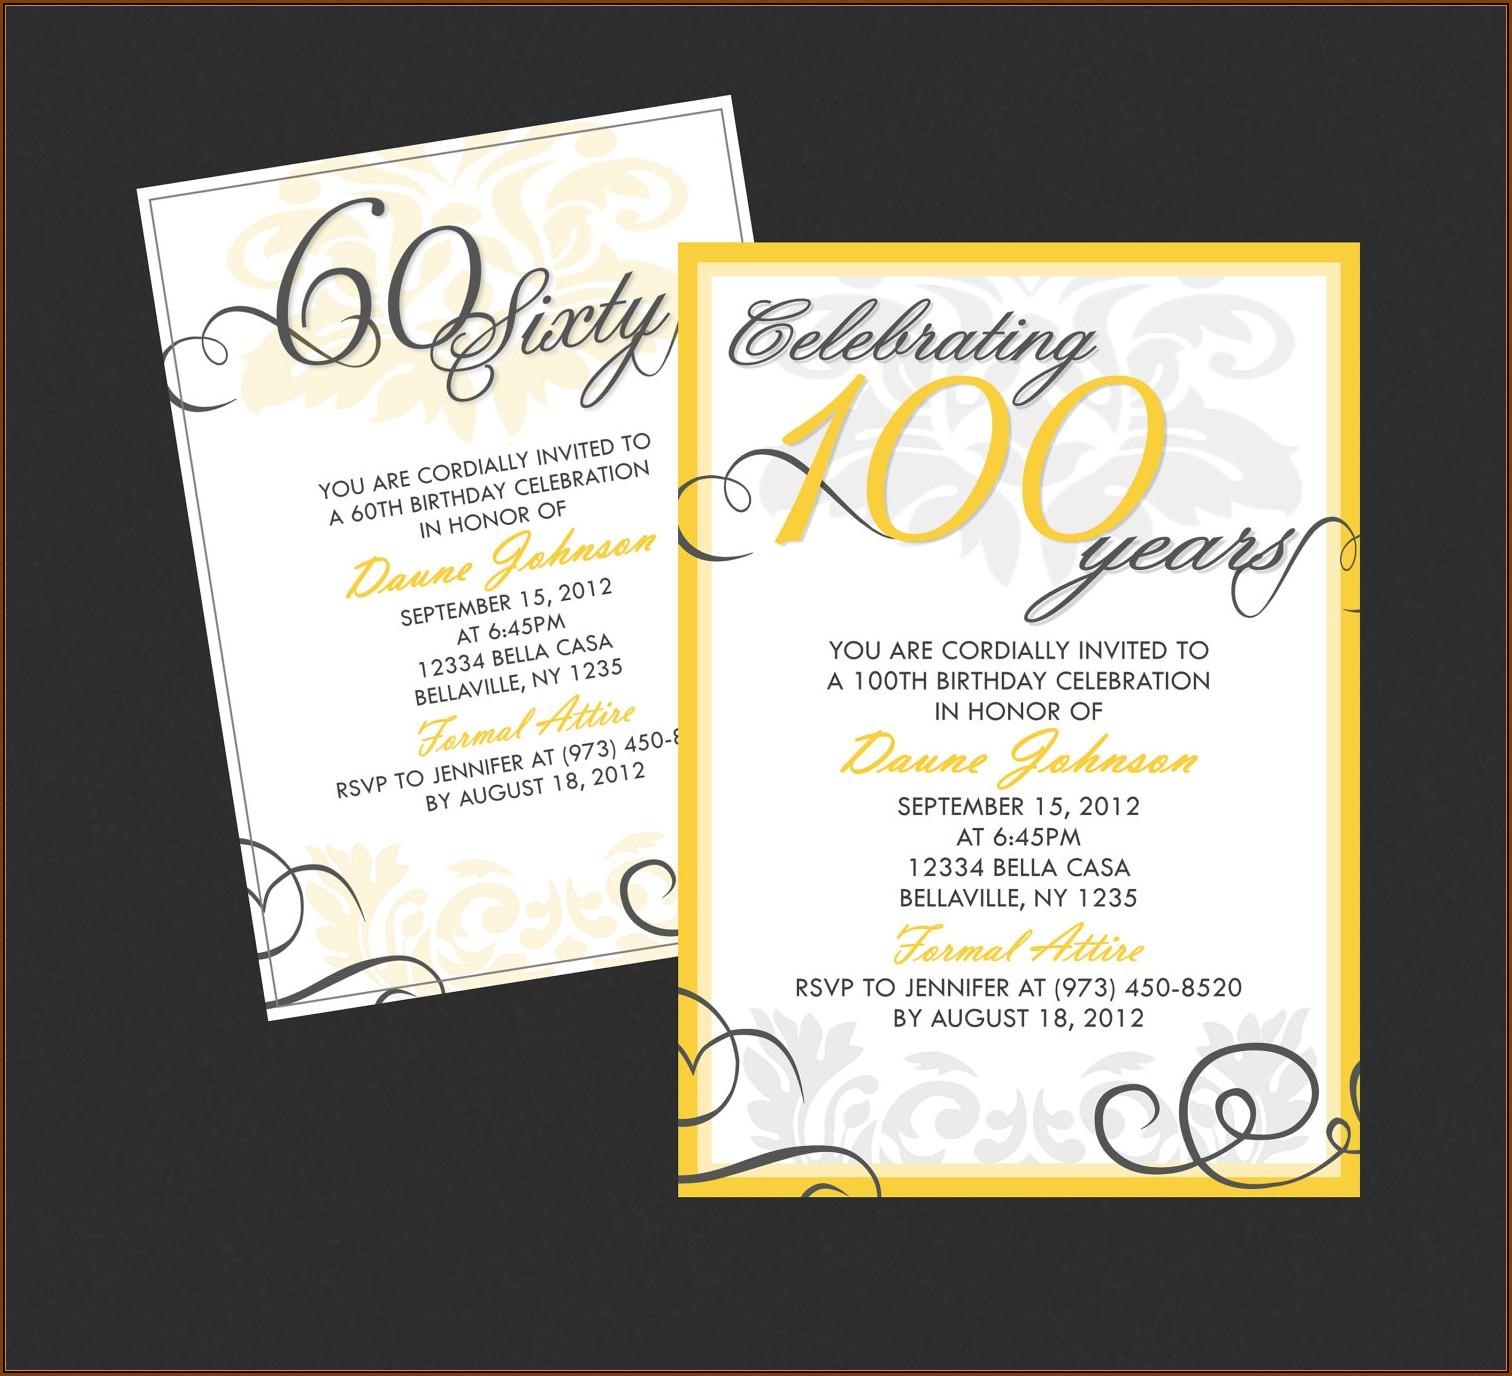 Classy Birthday Invitation Templates